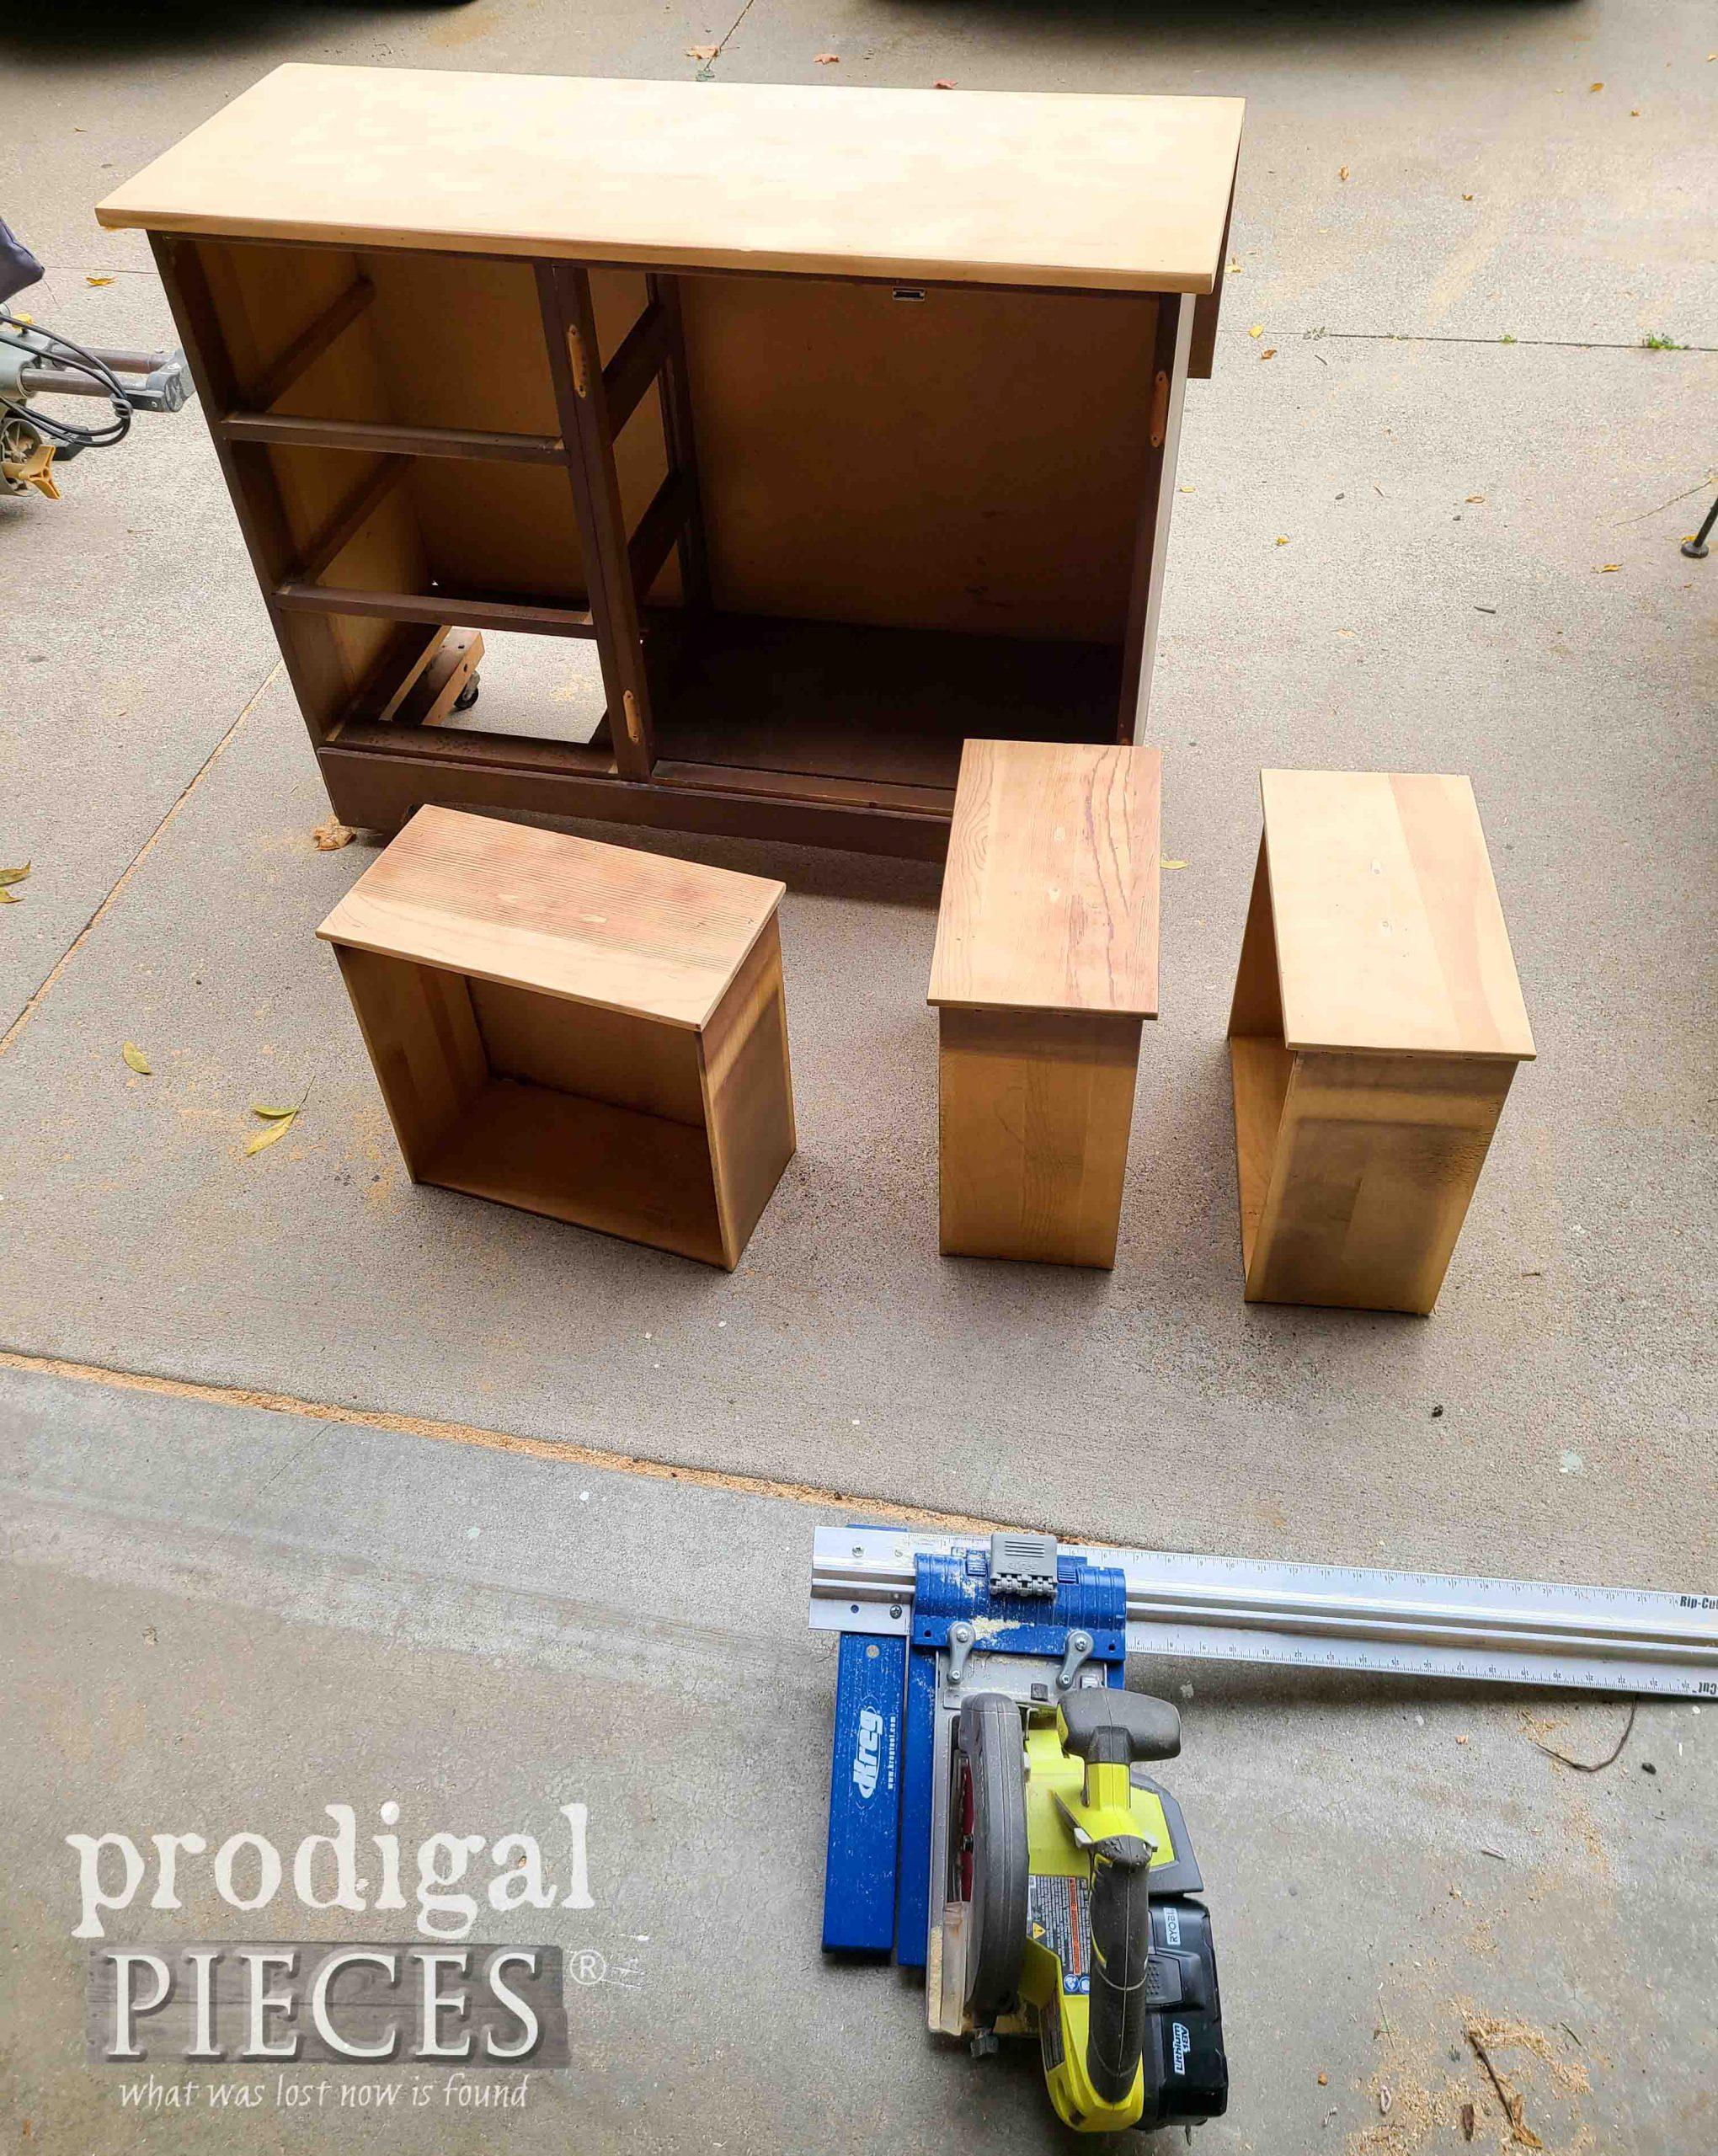 Rebuilding Vintage Cabinet for DIY Coffee Bar | prodigalpieces.com